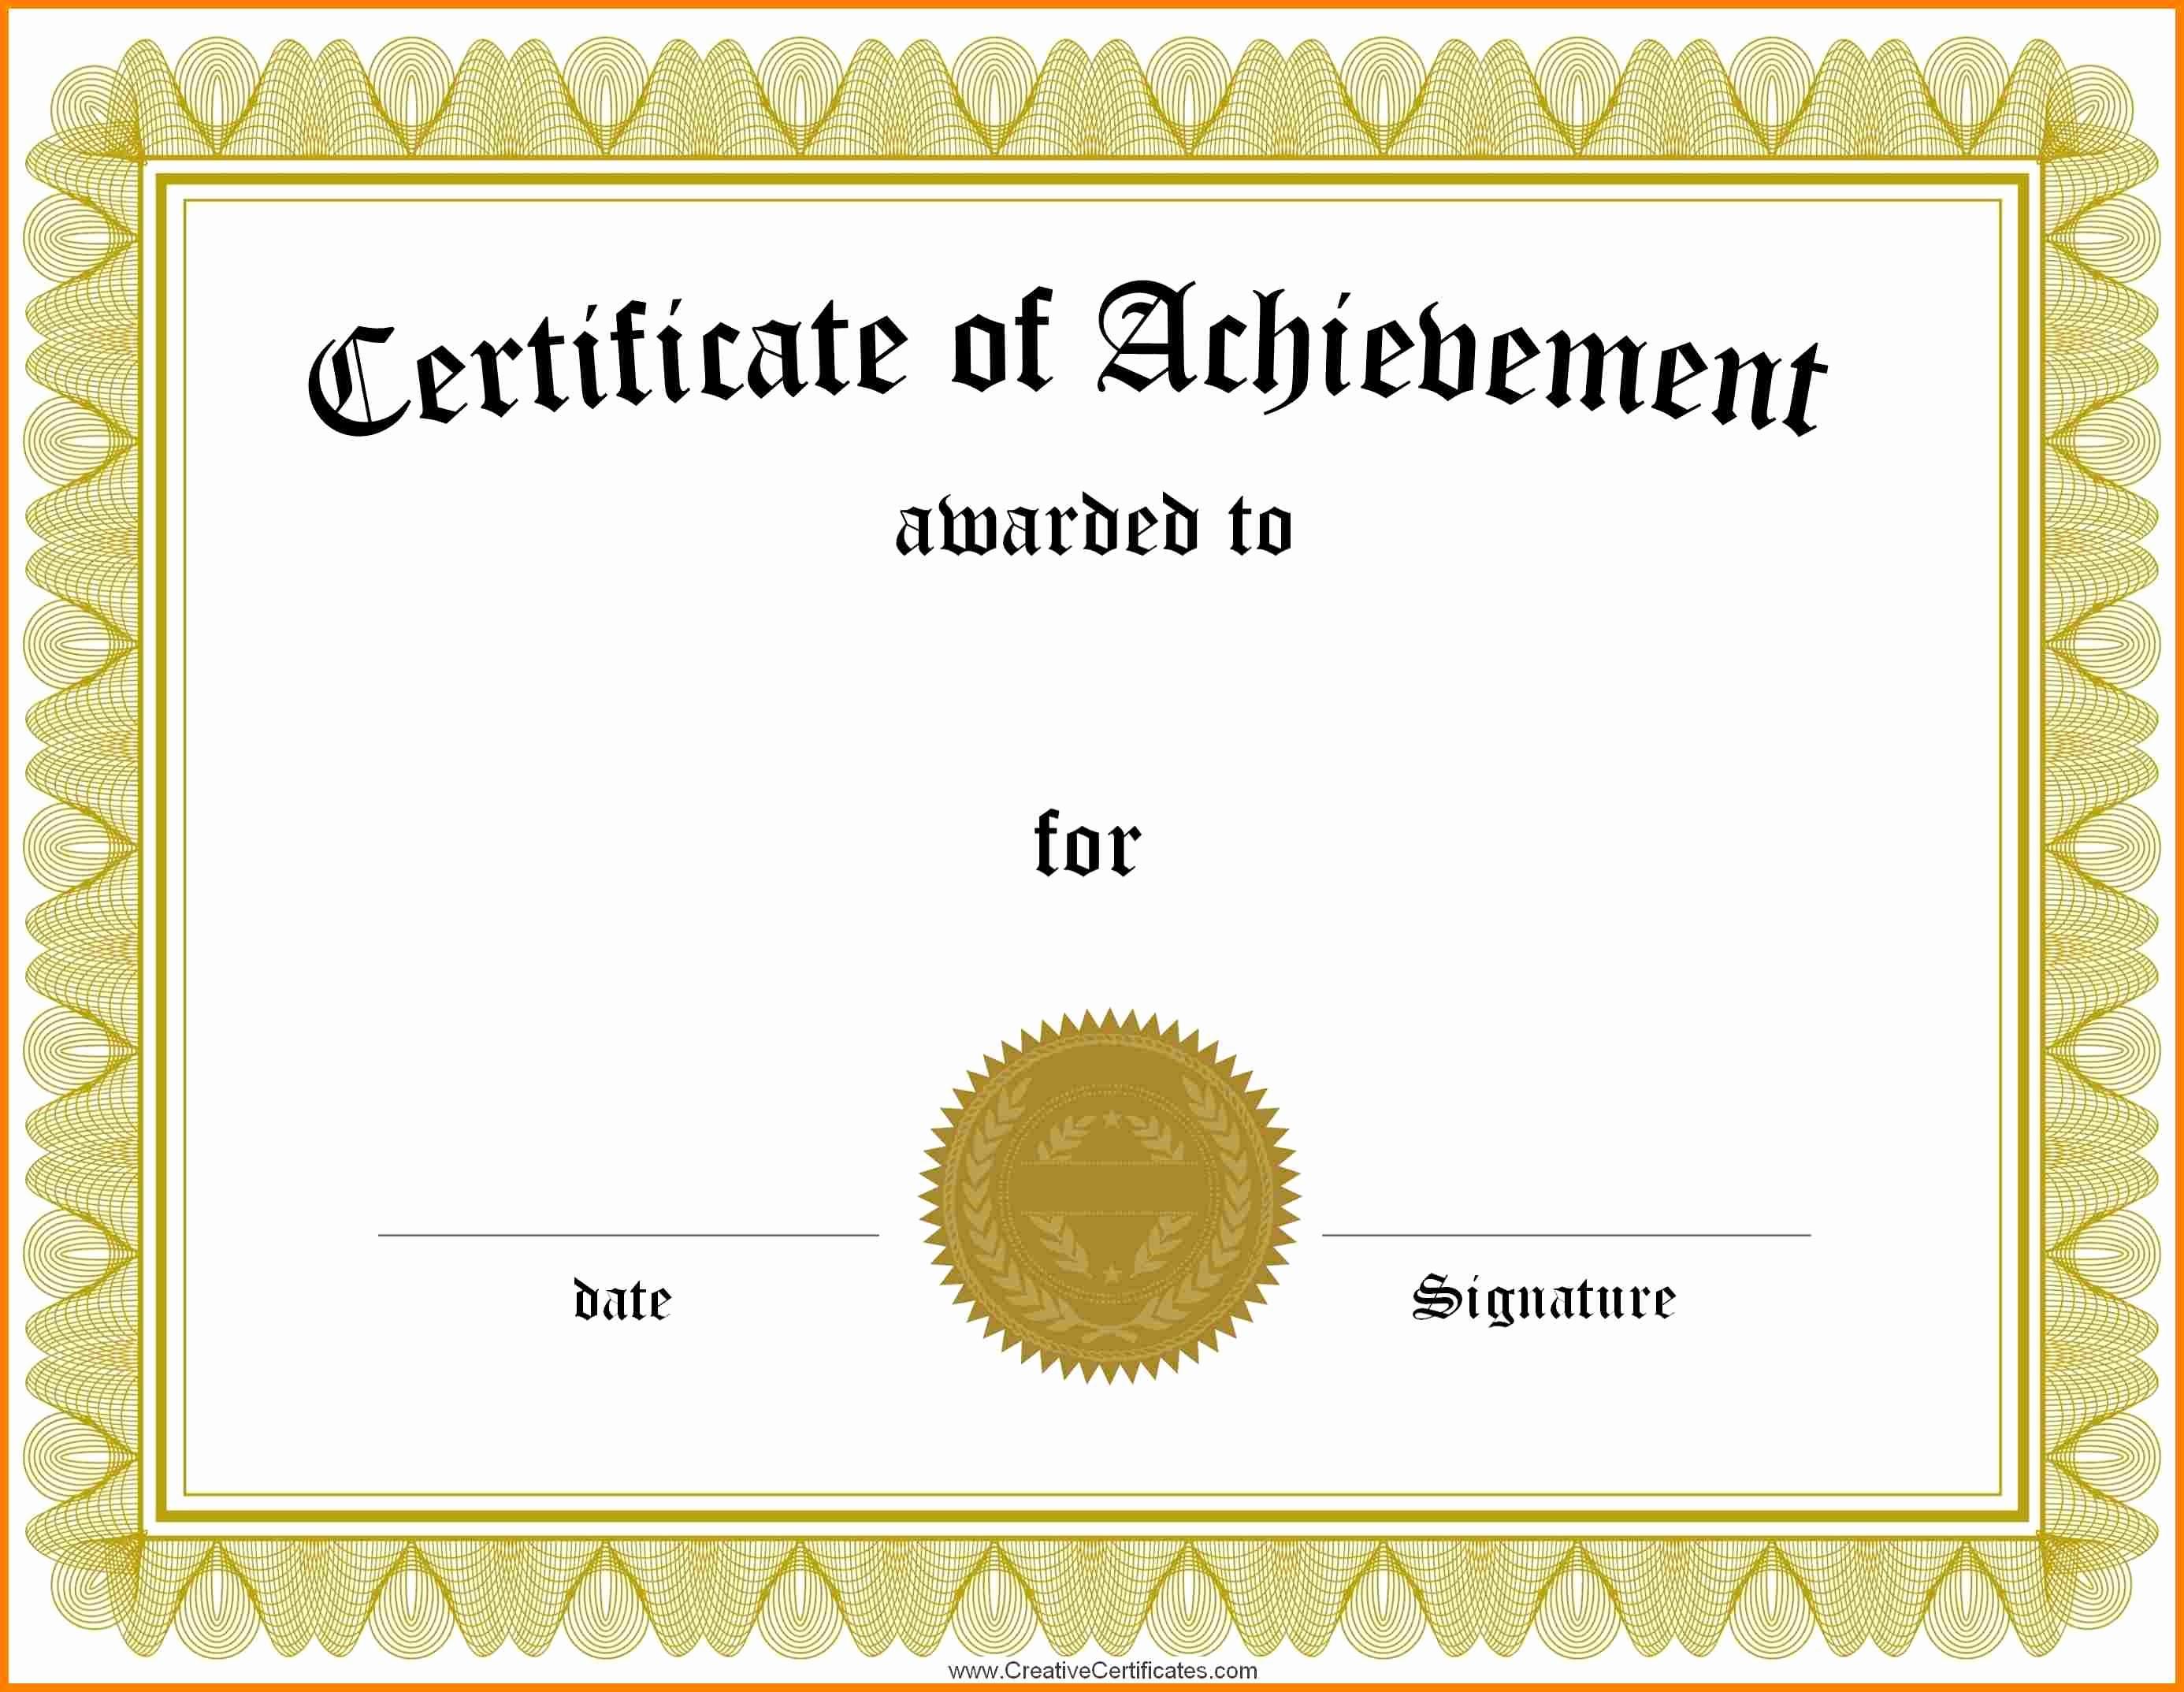 Free Award Certificate Template Word Elegant Blank Certificate forms Portablegasgrillweber